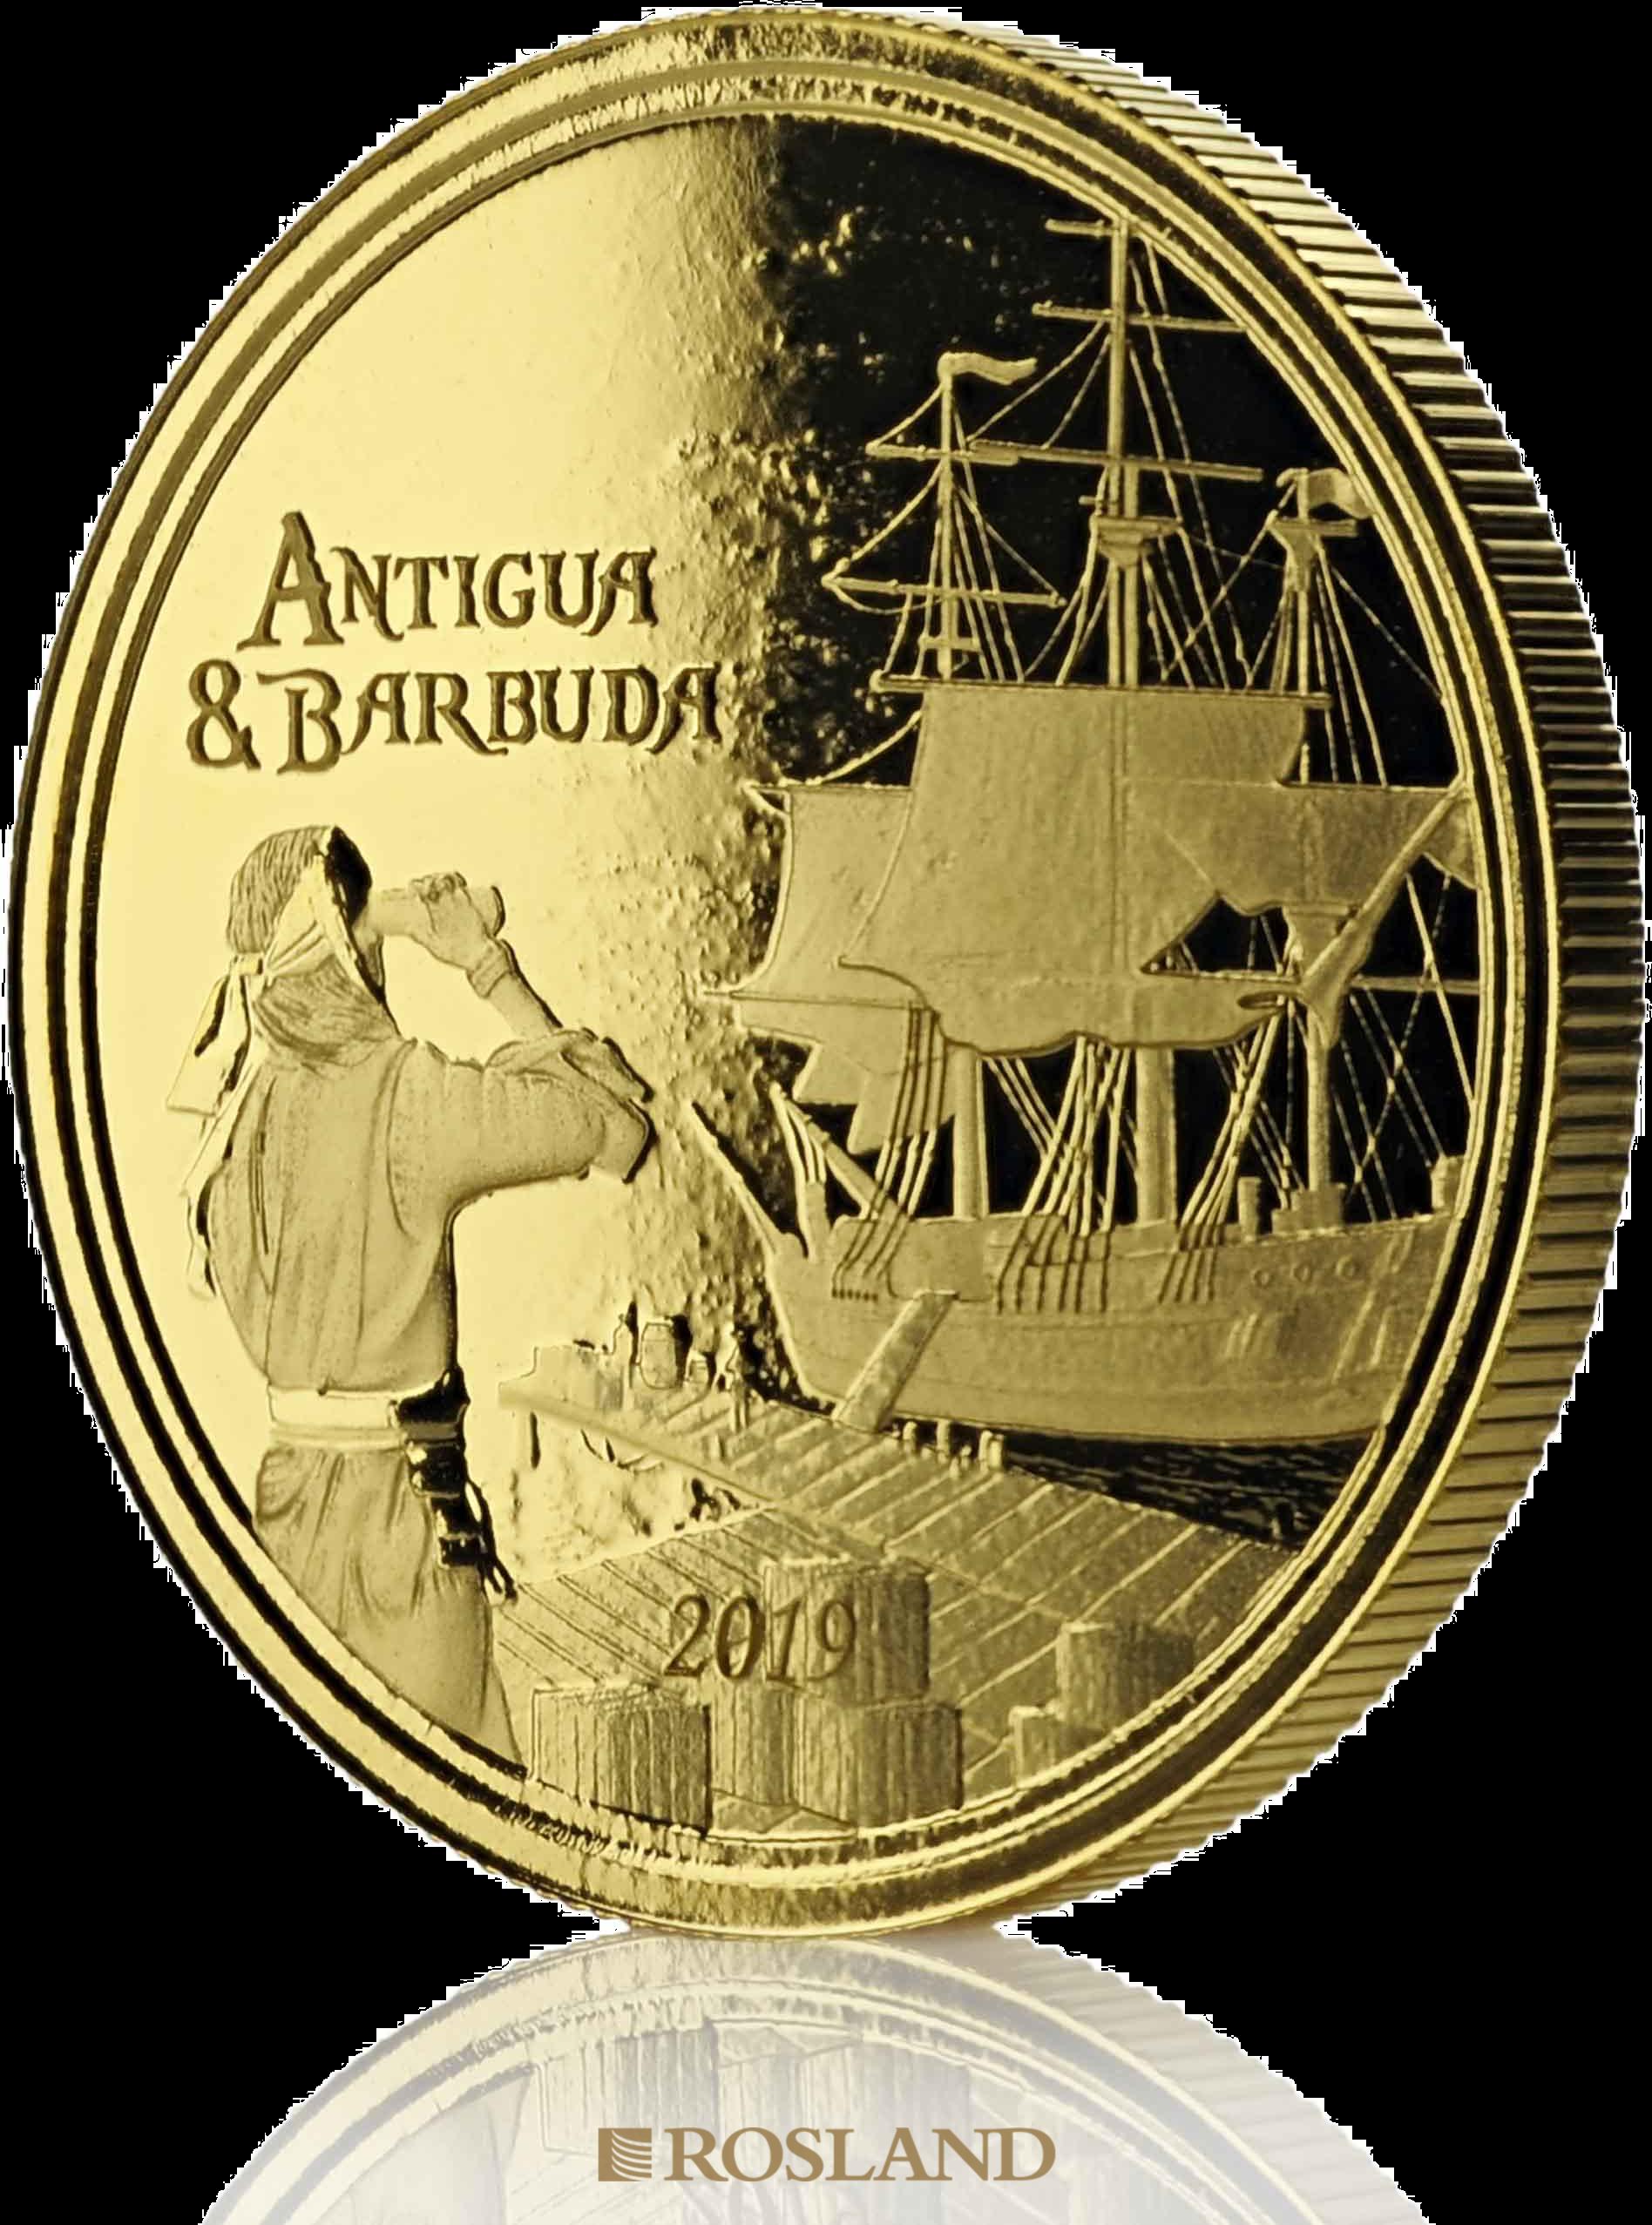 1 Unze Goldmünze EC8 Antigua & Barbuda Rum Runner 2019 (Blister, Zertifikat)